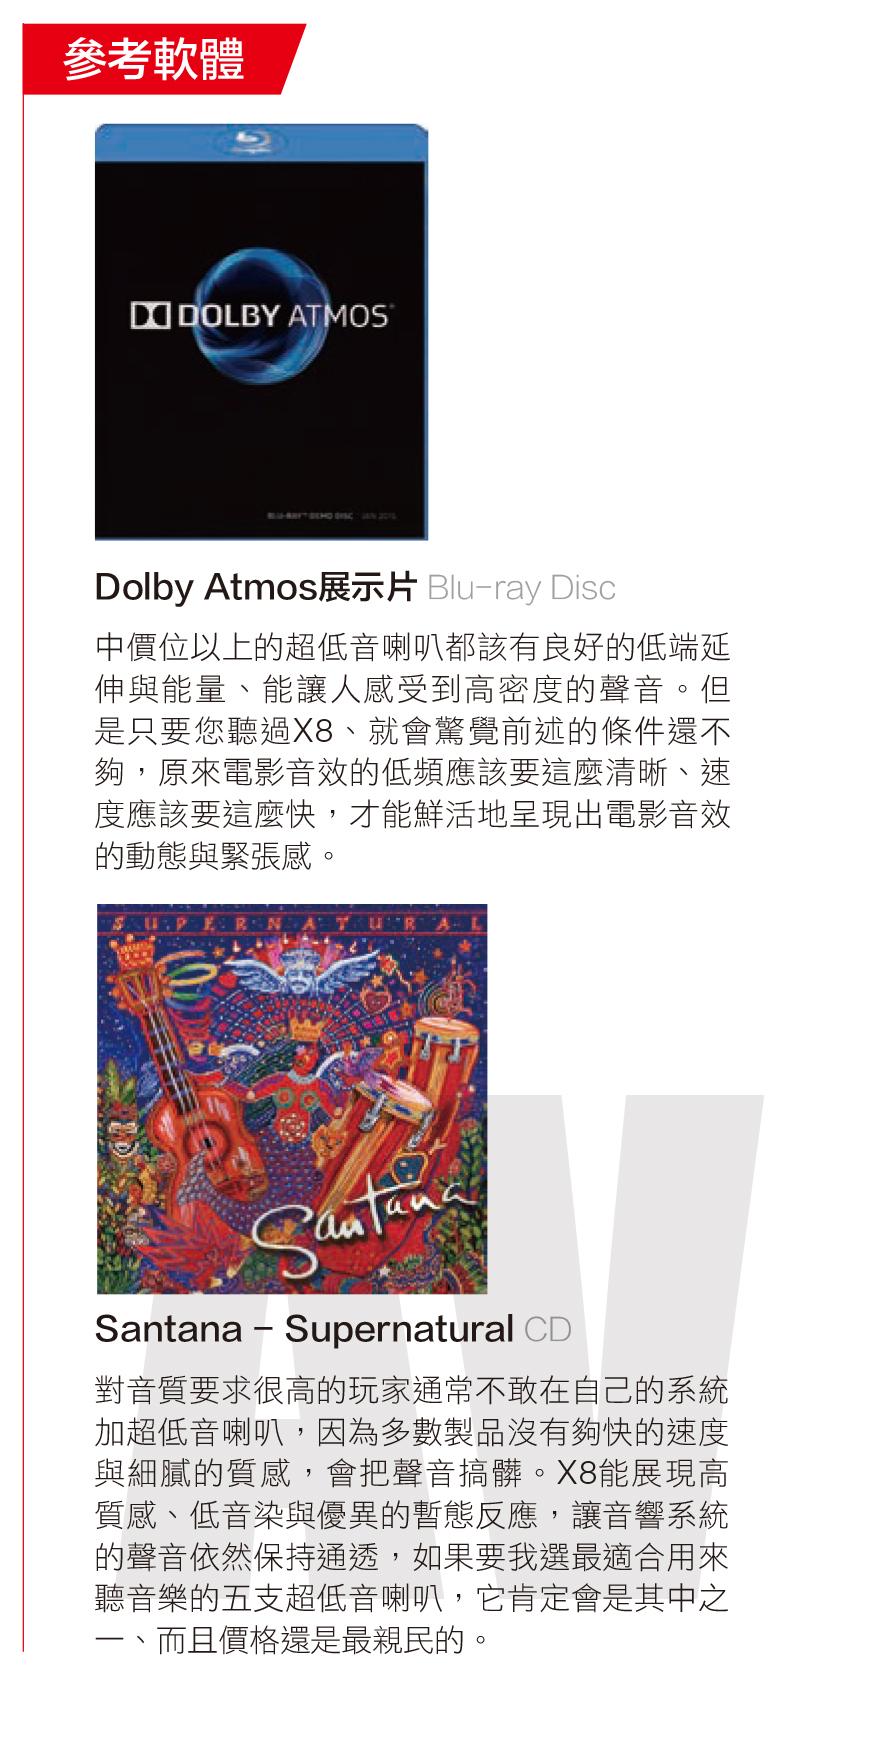 M&K Sound X8-測試軟體-Dolby Atmos-Santana Supernatural